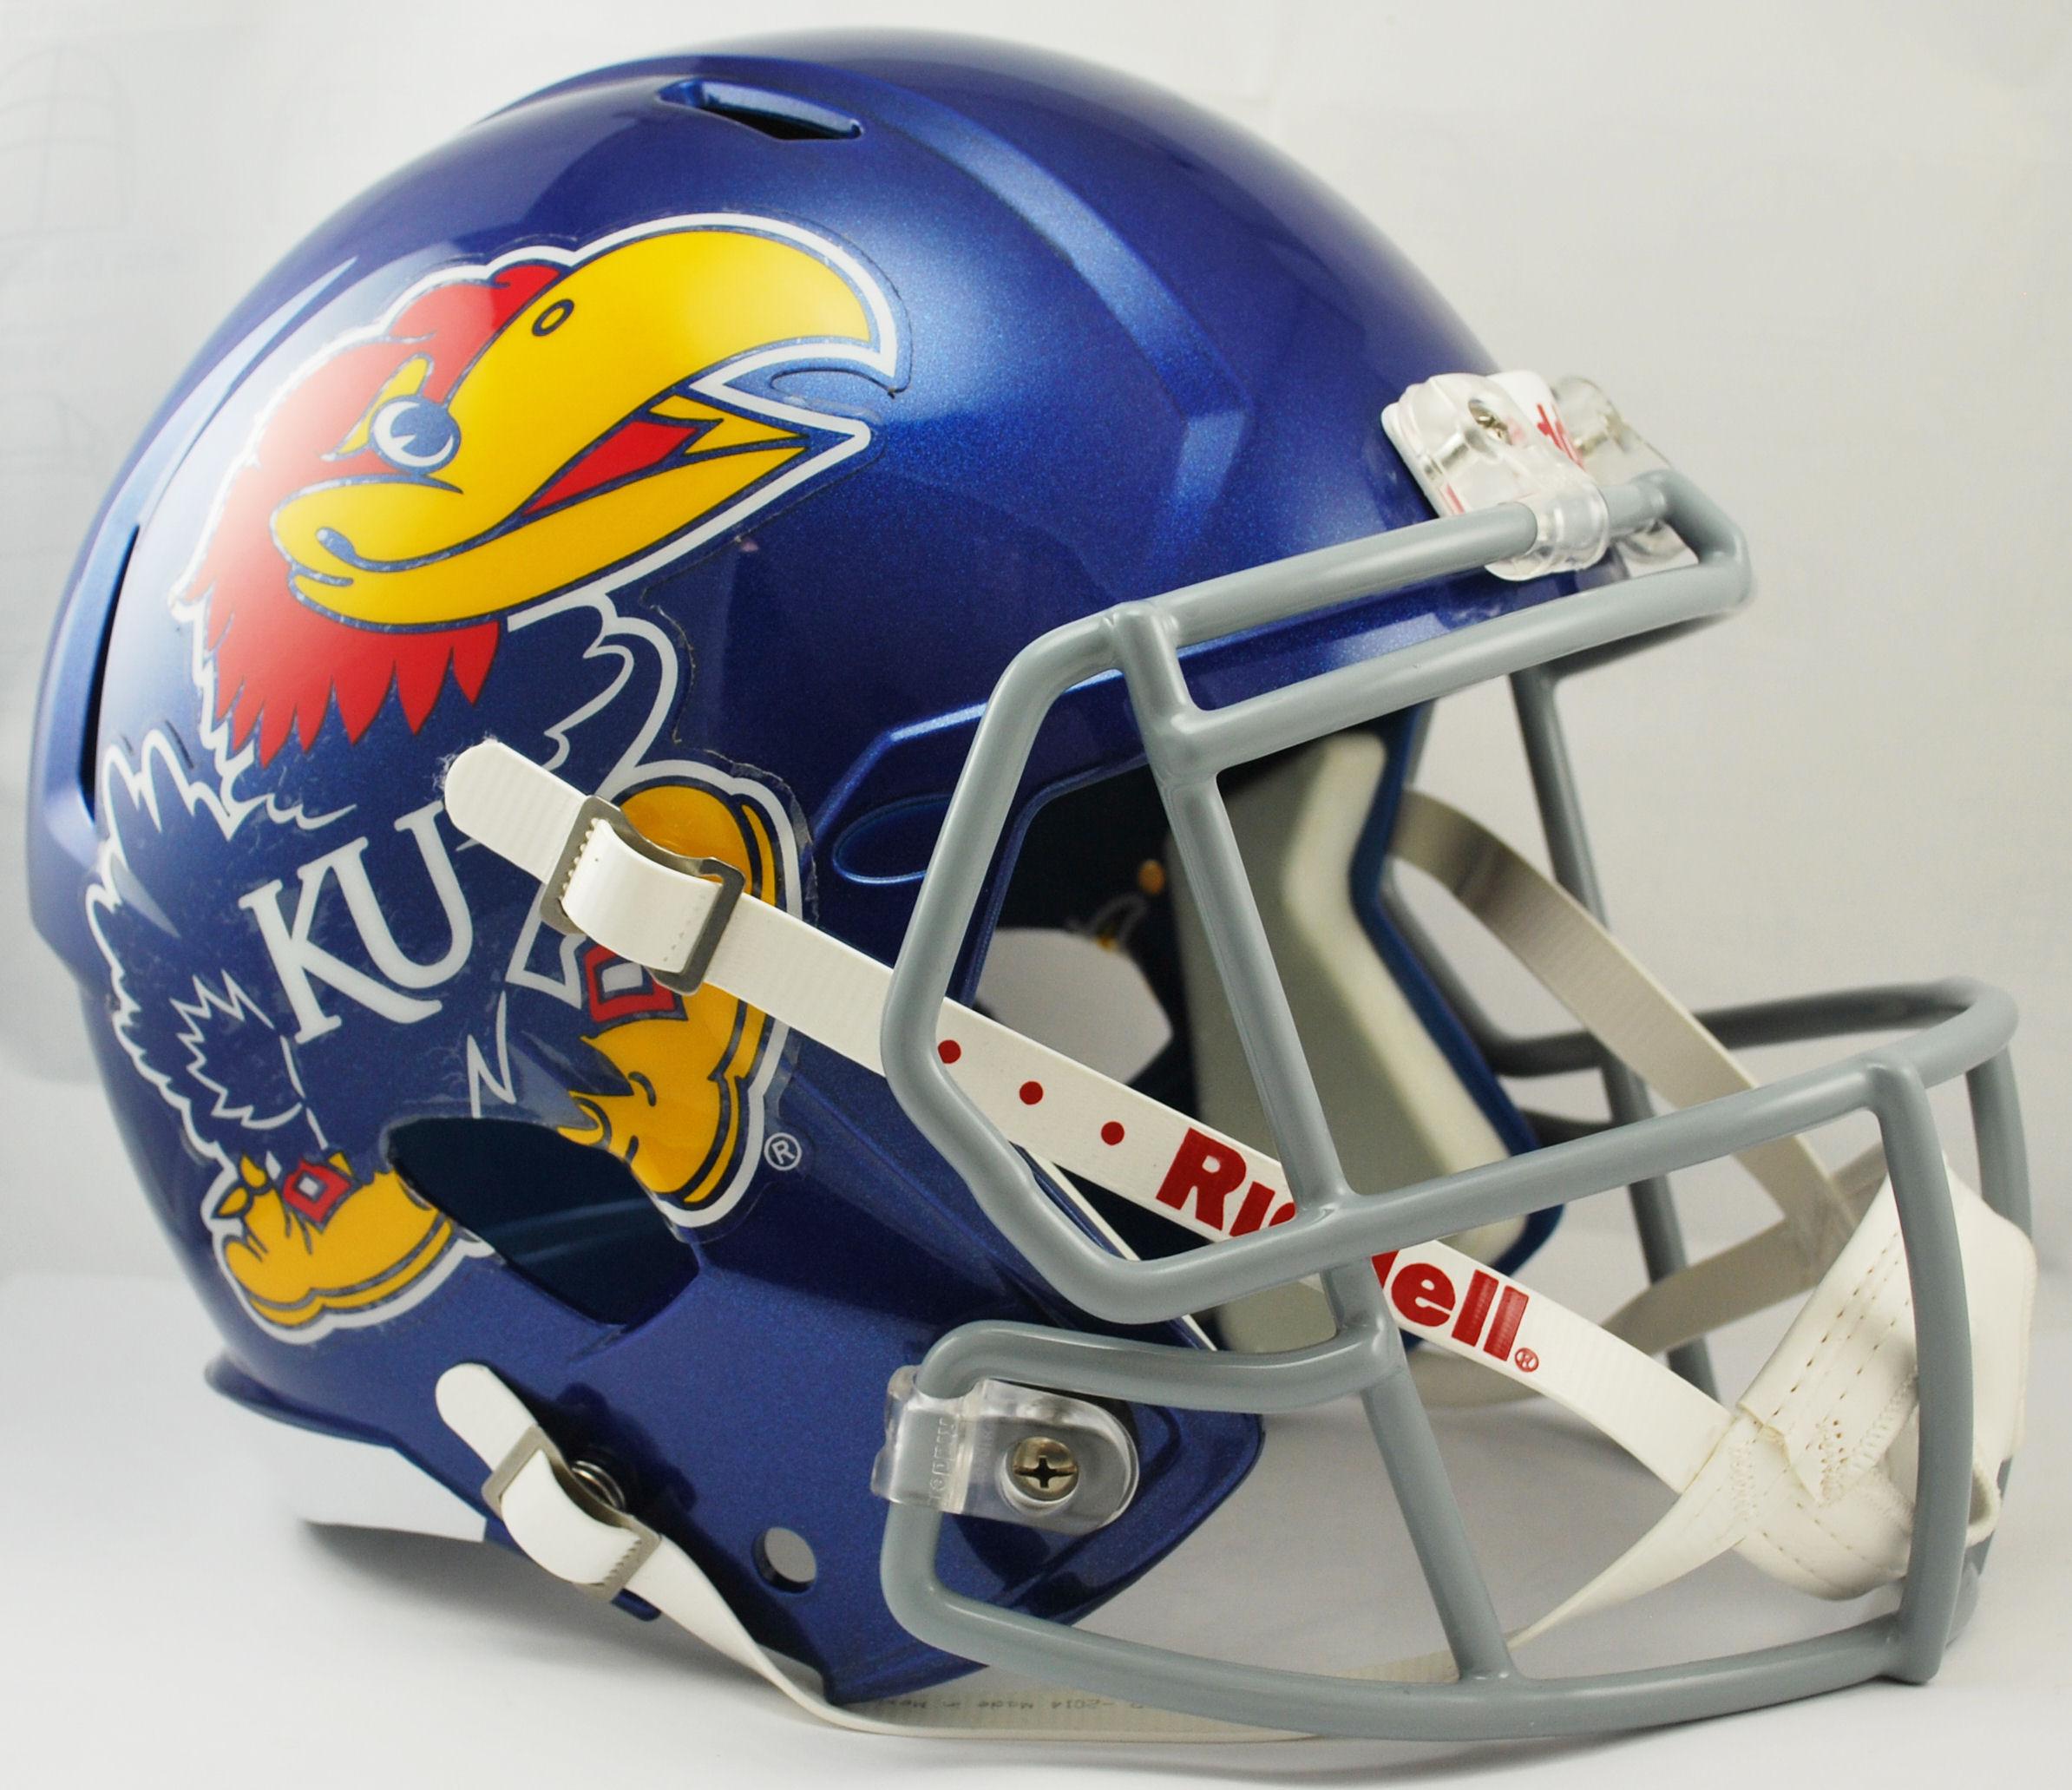 Kansas Jayhawks Speed Replica Football Helmet